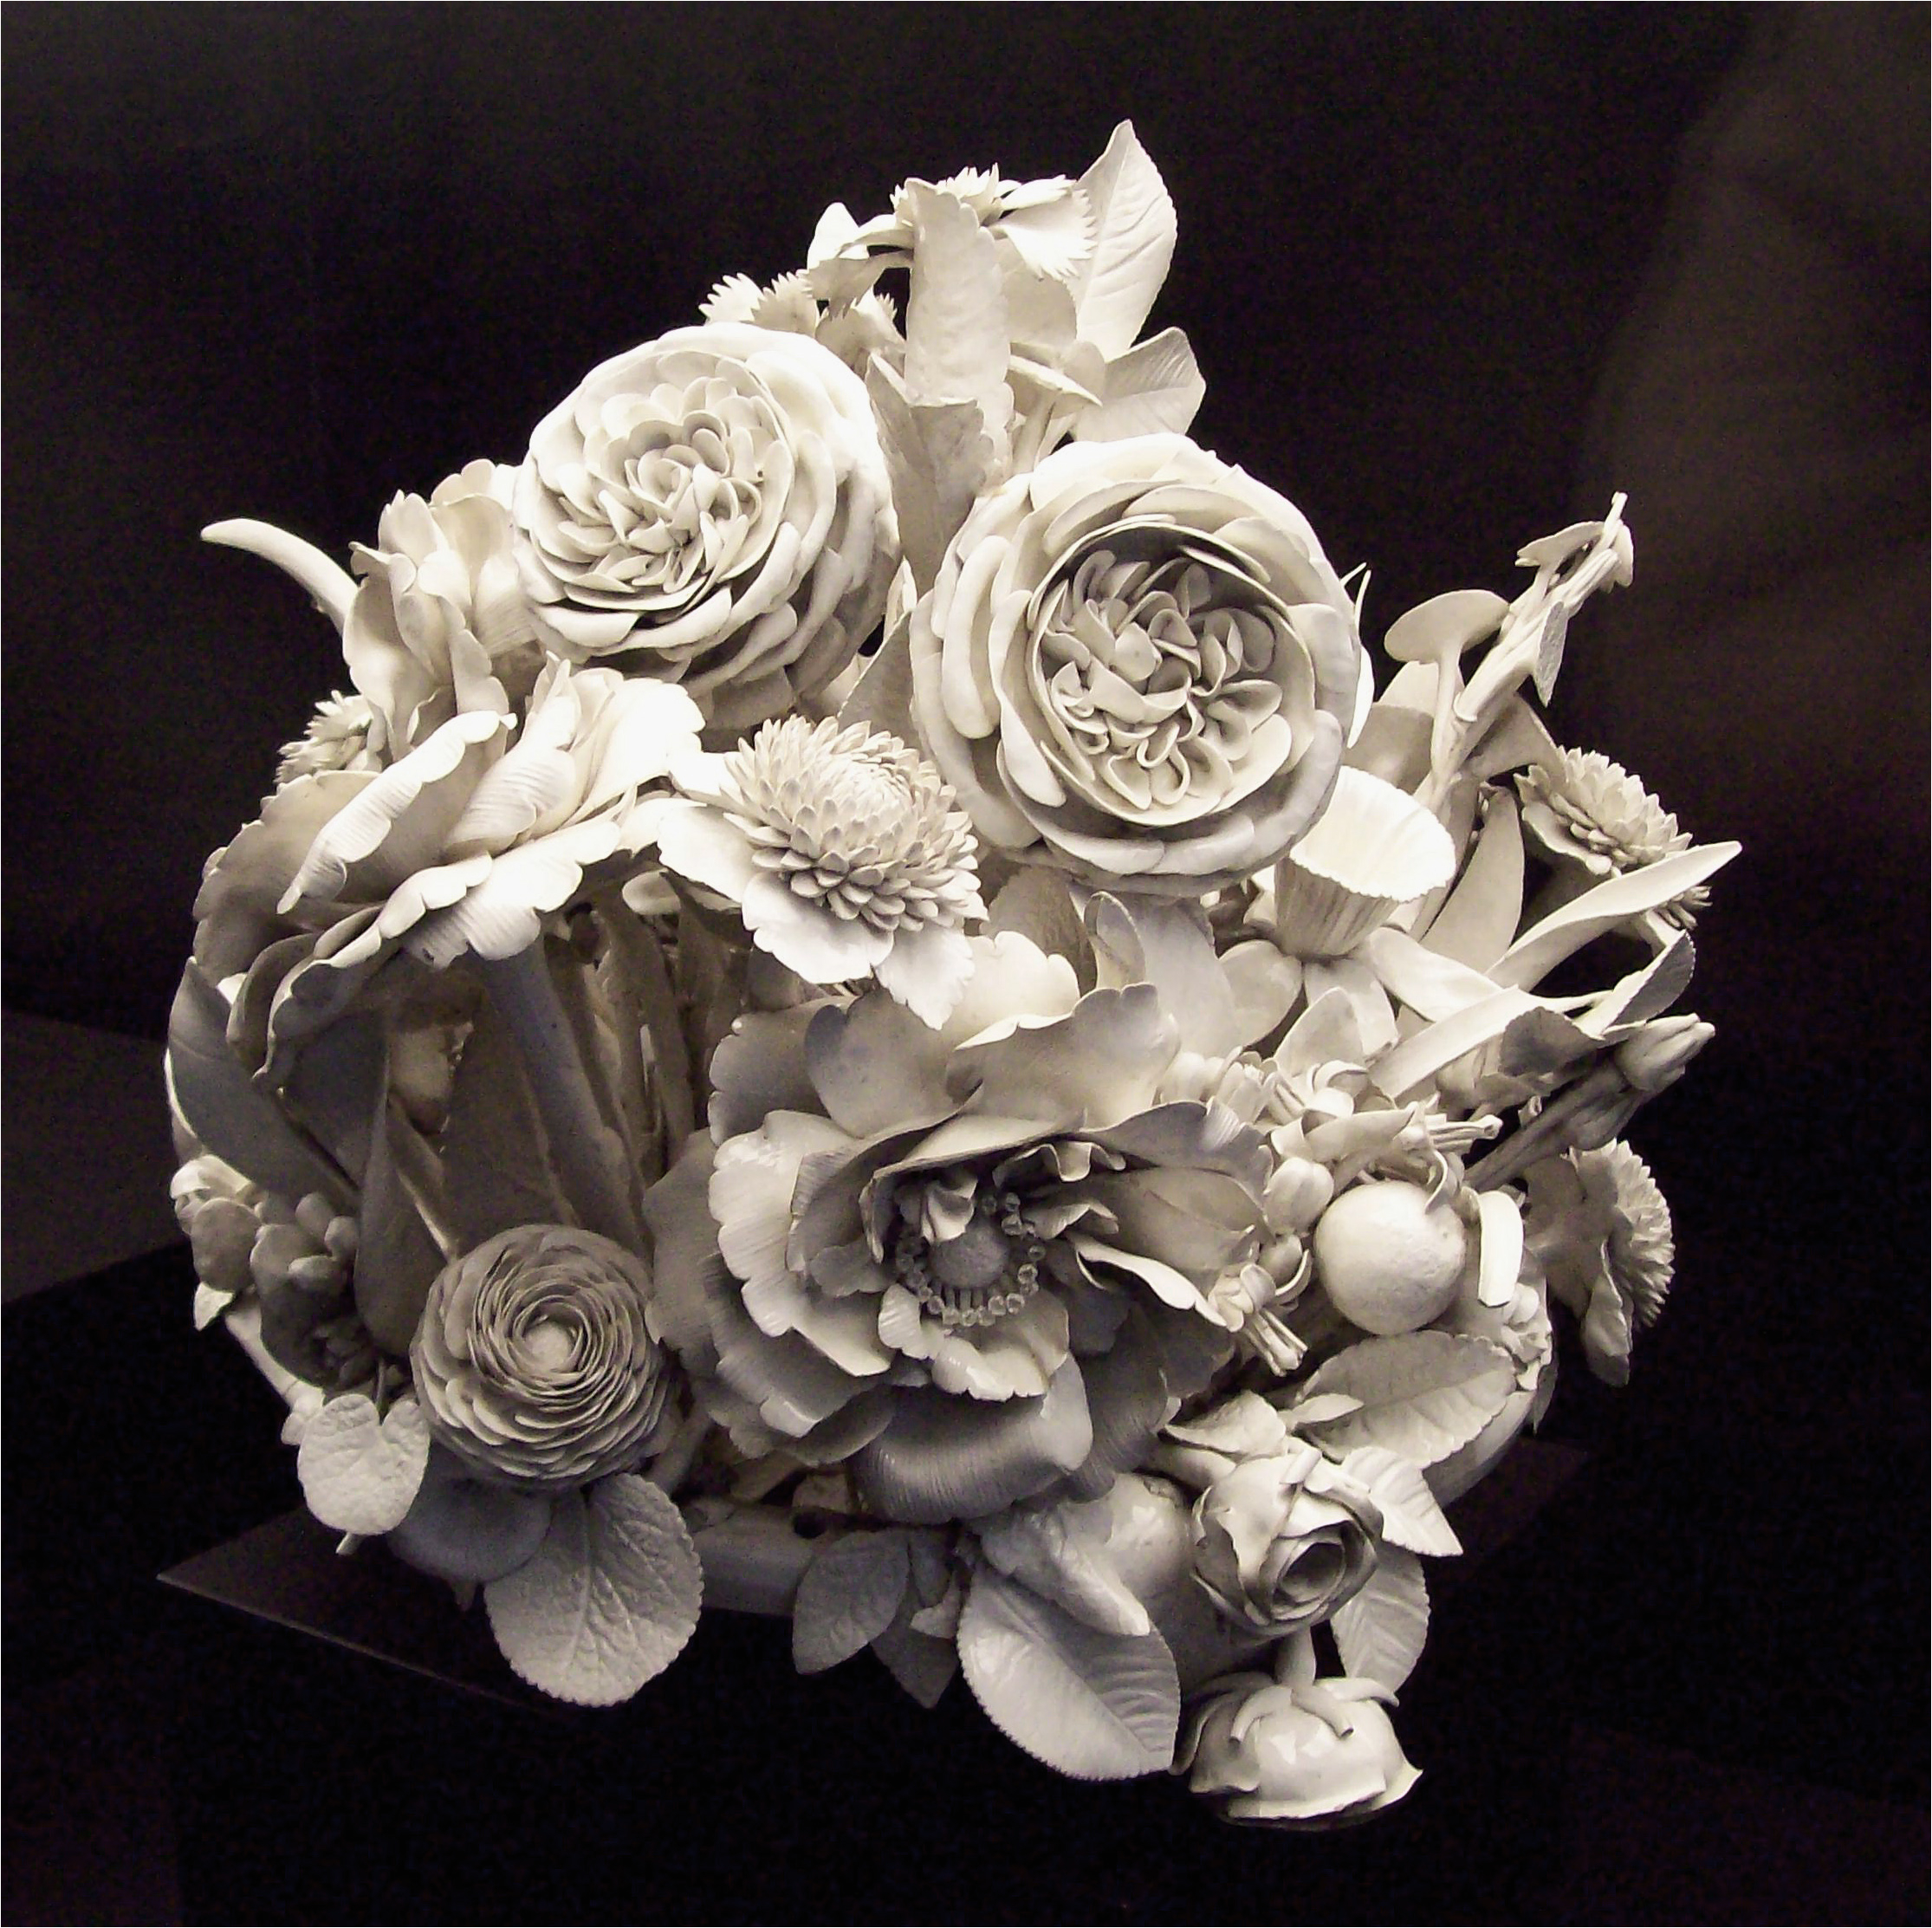 file centro de flores porcelana buen retiro man 1982 85 5 01